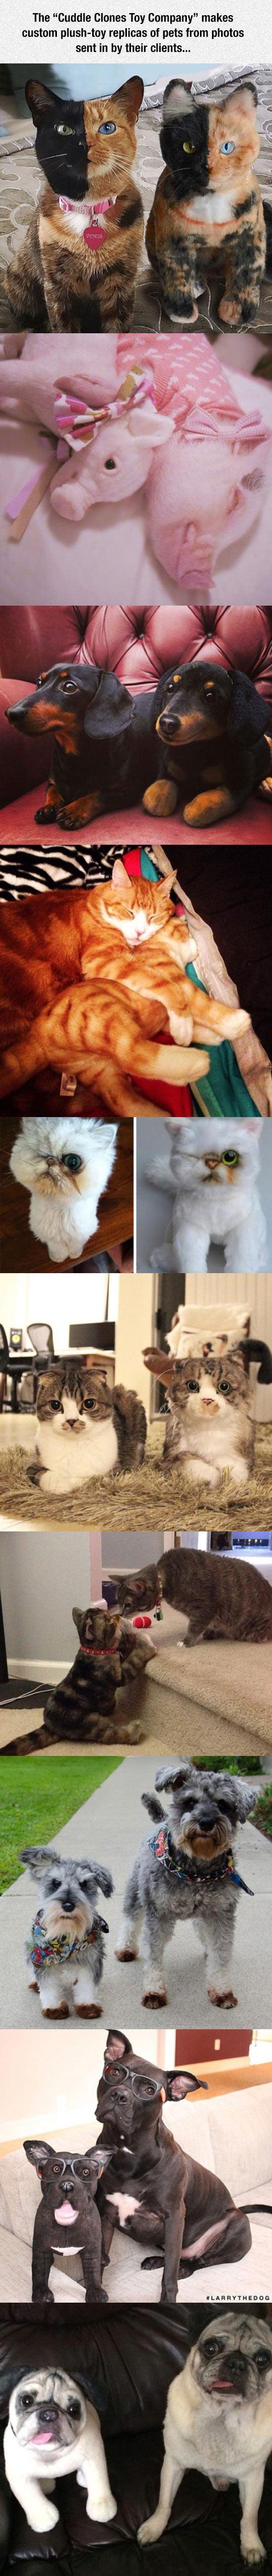 plush-toys-pets-animals